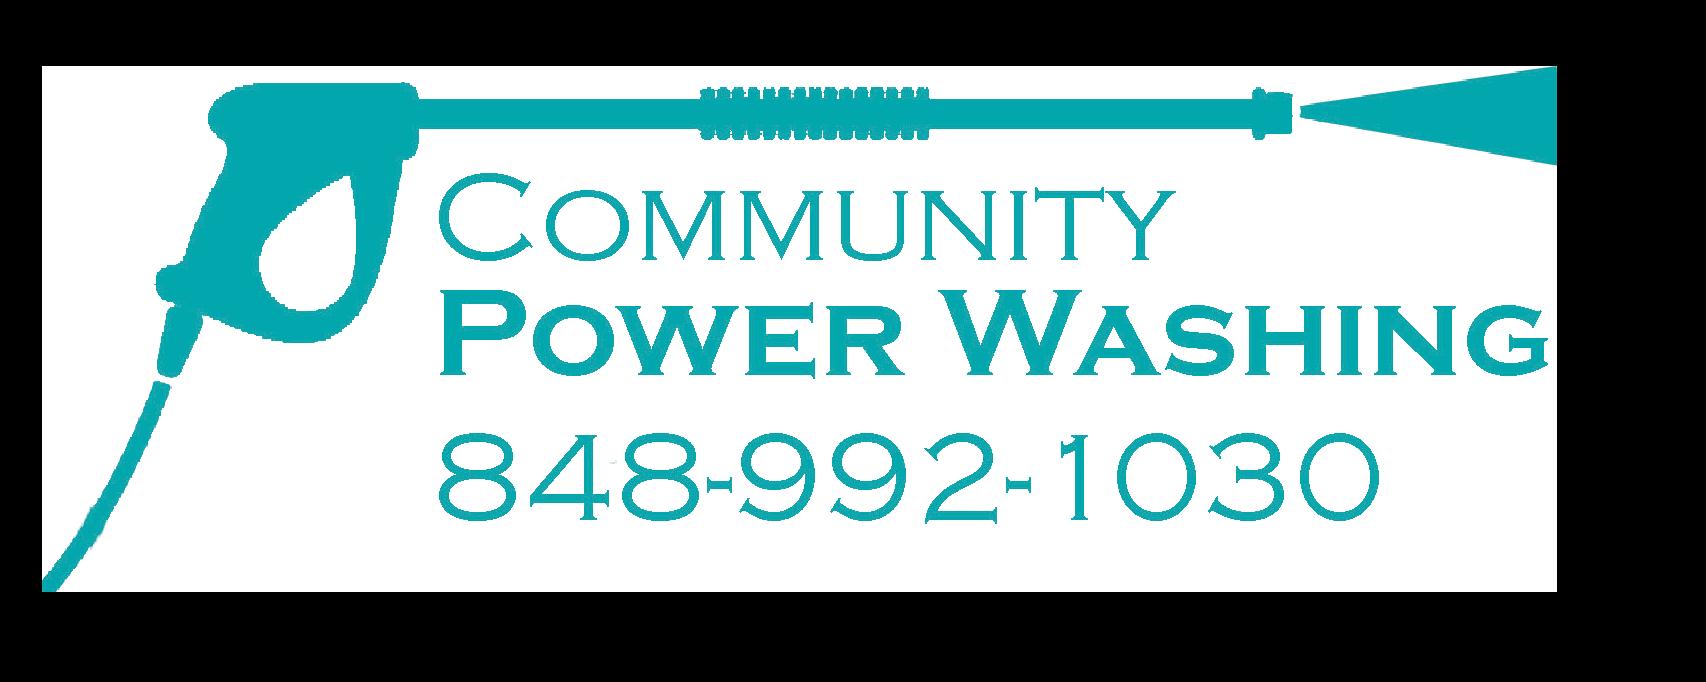 Sponsor Community Power Washing